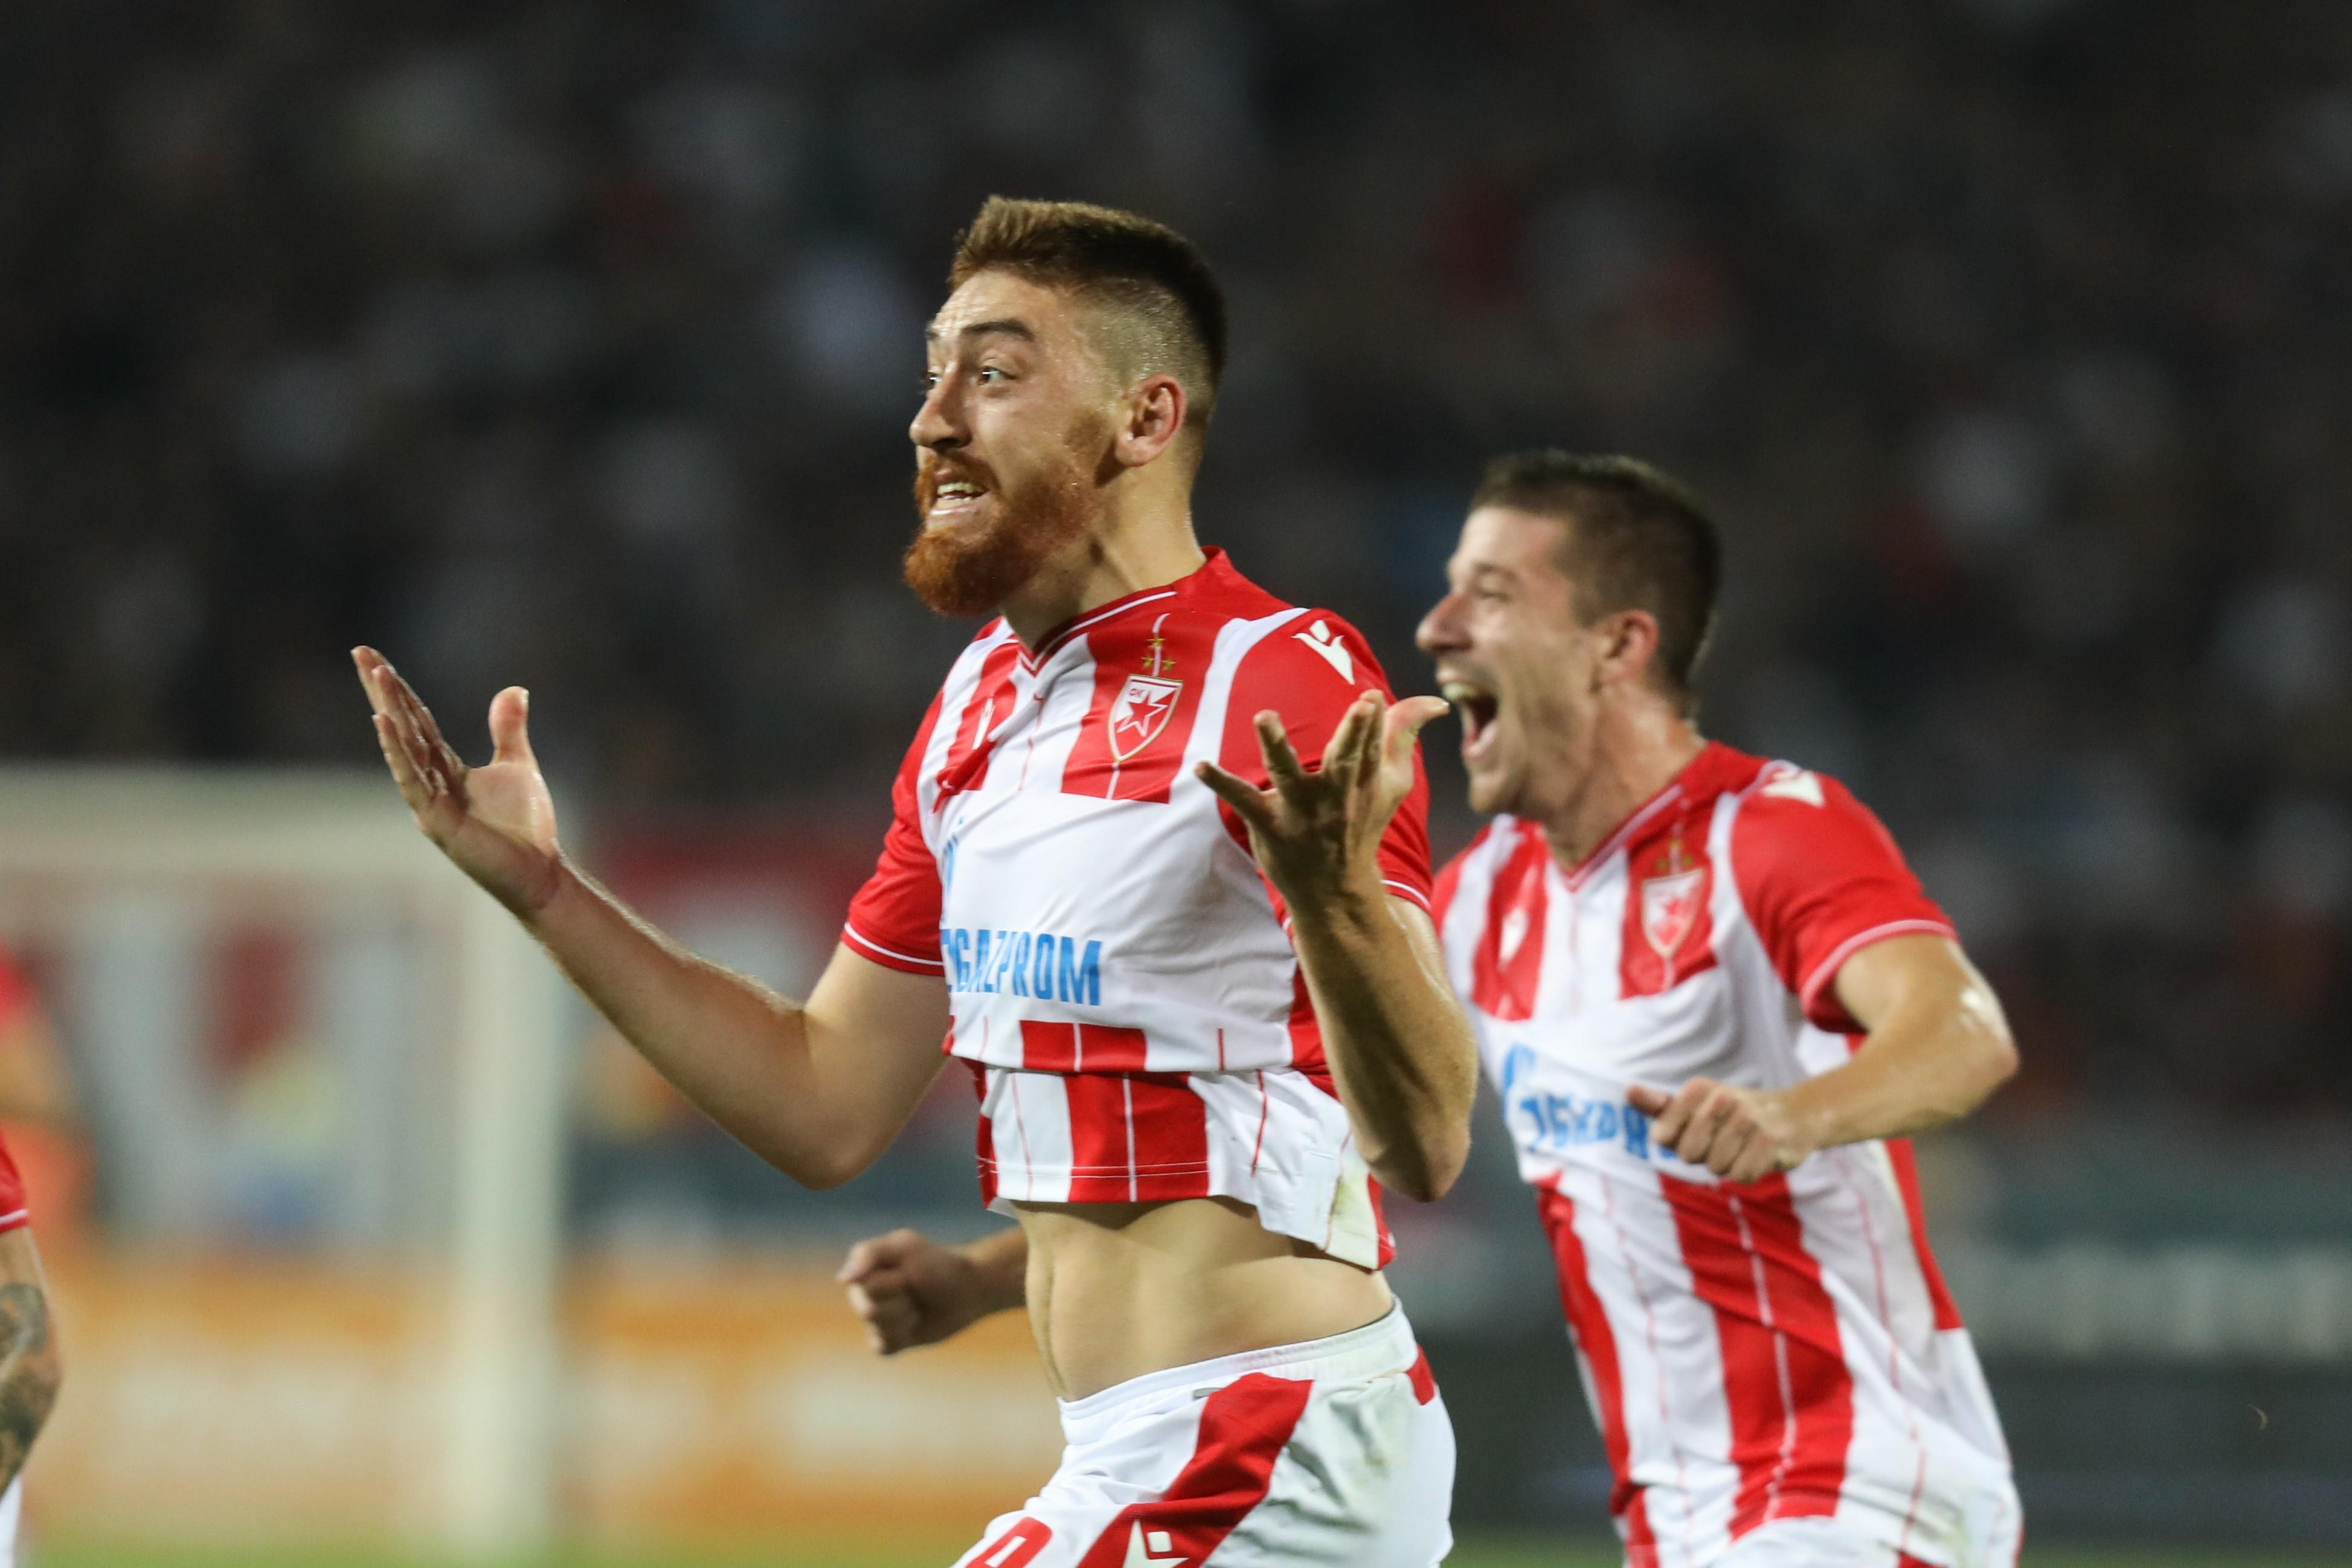 Šokantan preokret Zvezde na Marakani: Crveno-beli pobedili sa dva penala za tri minuta! (VIDEO)